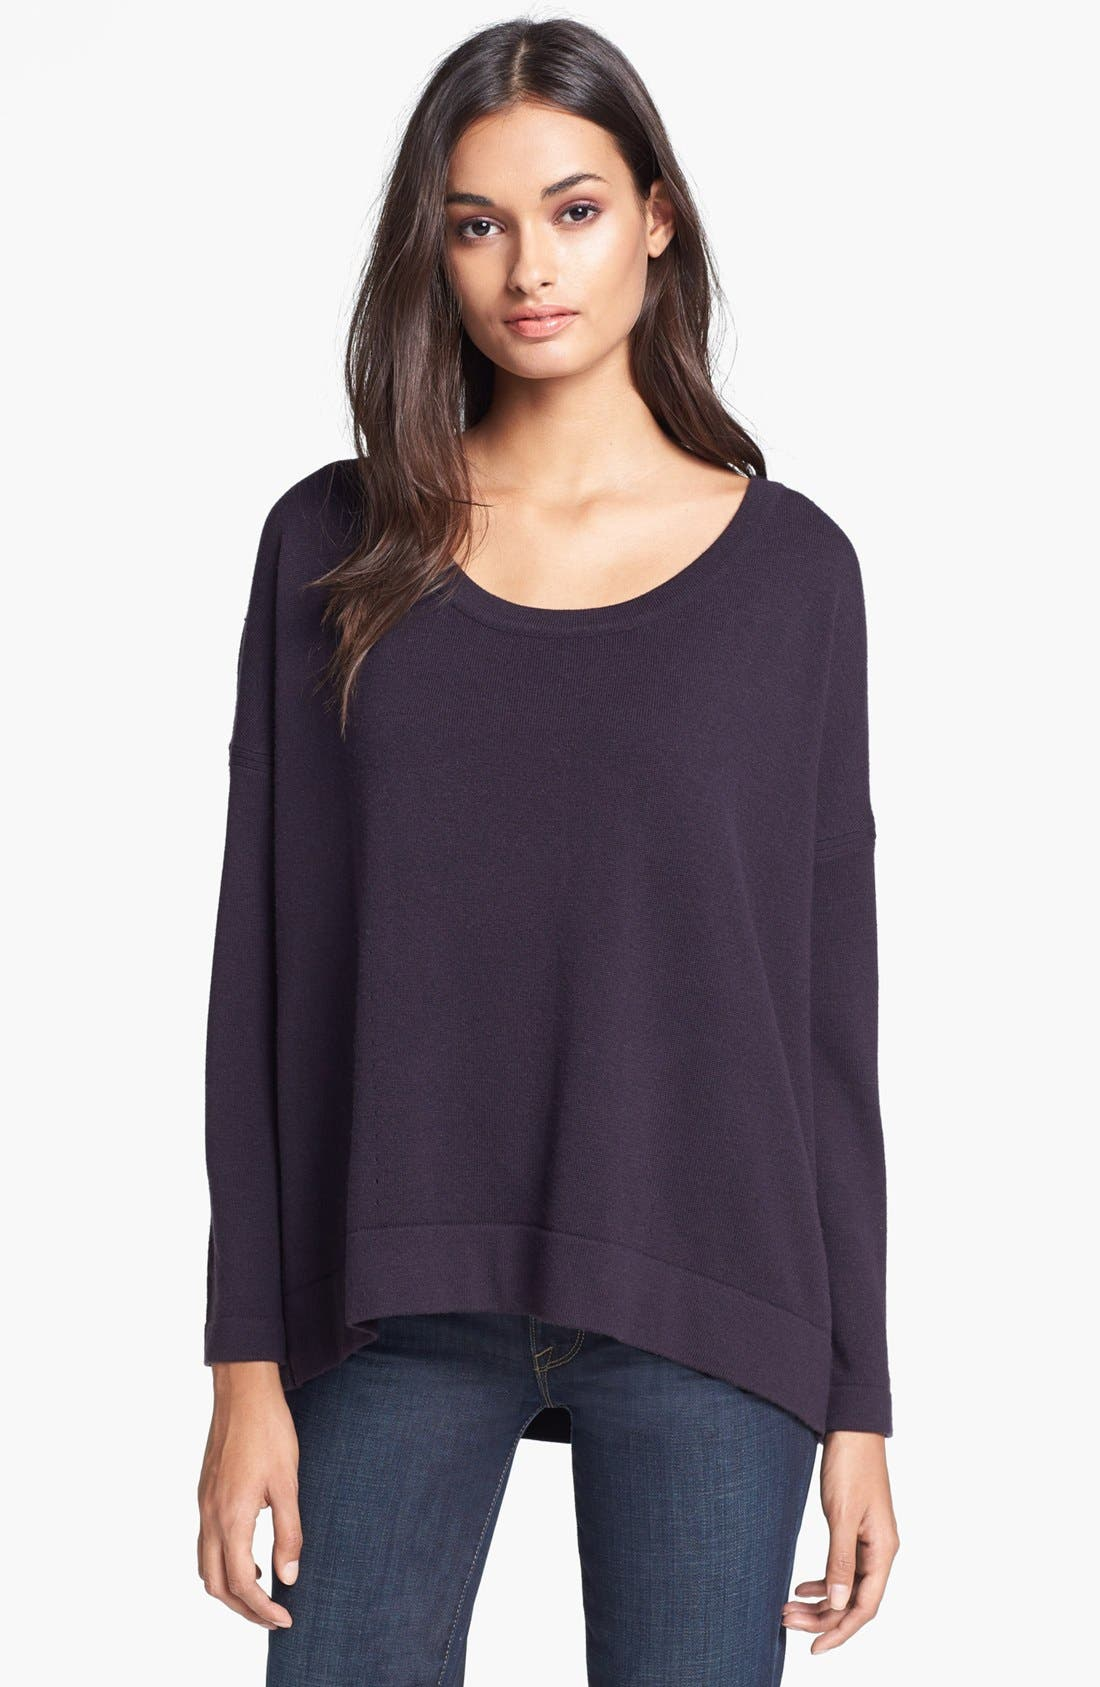 Main Image - rag & bone 'Noelle' Oversized Sweater